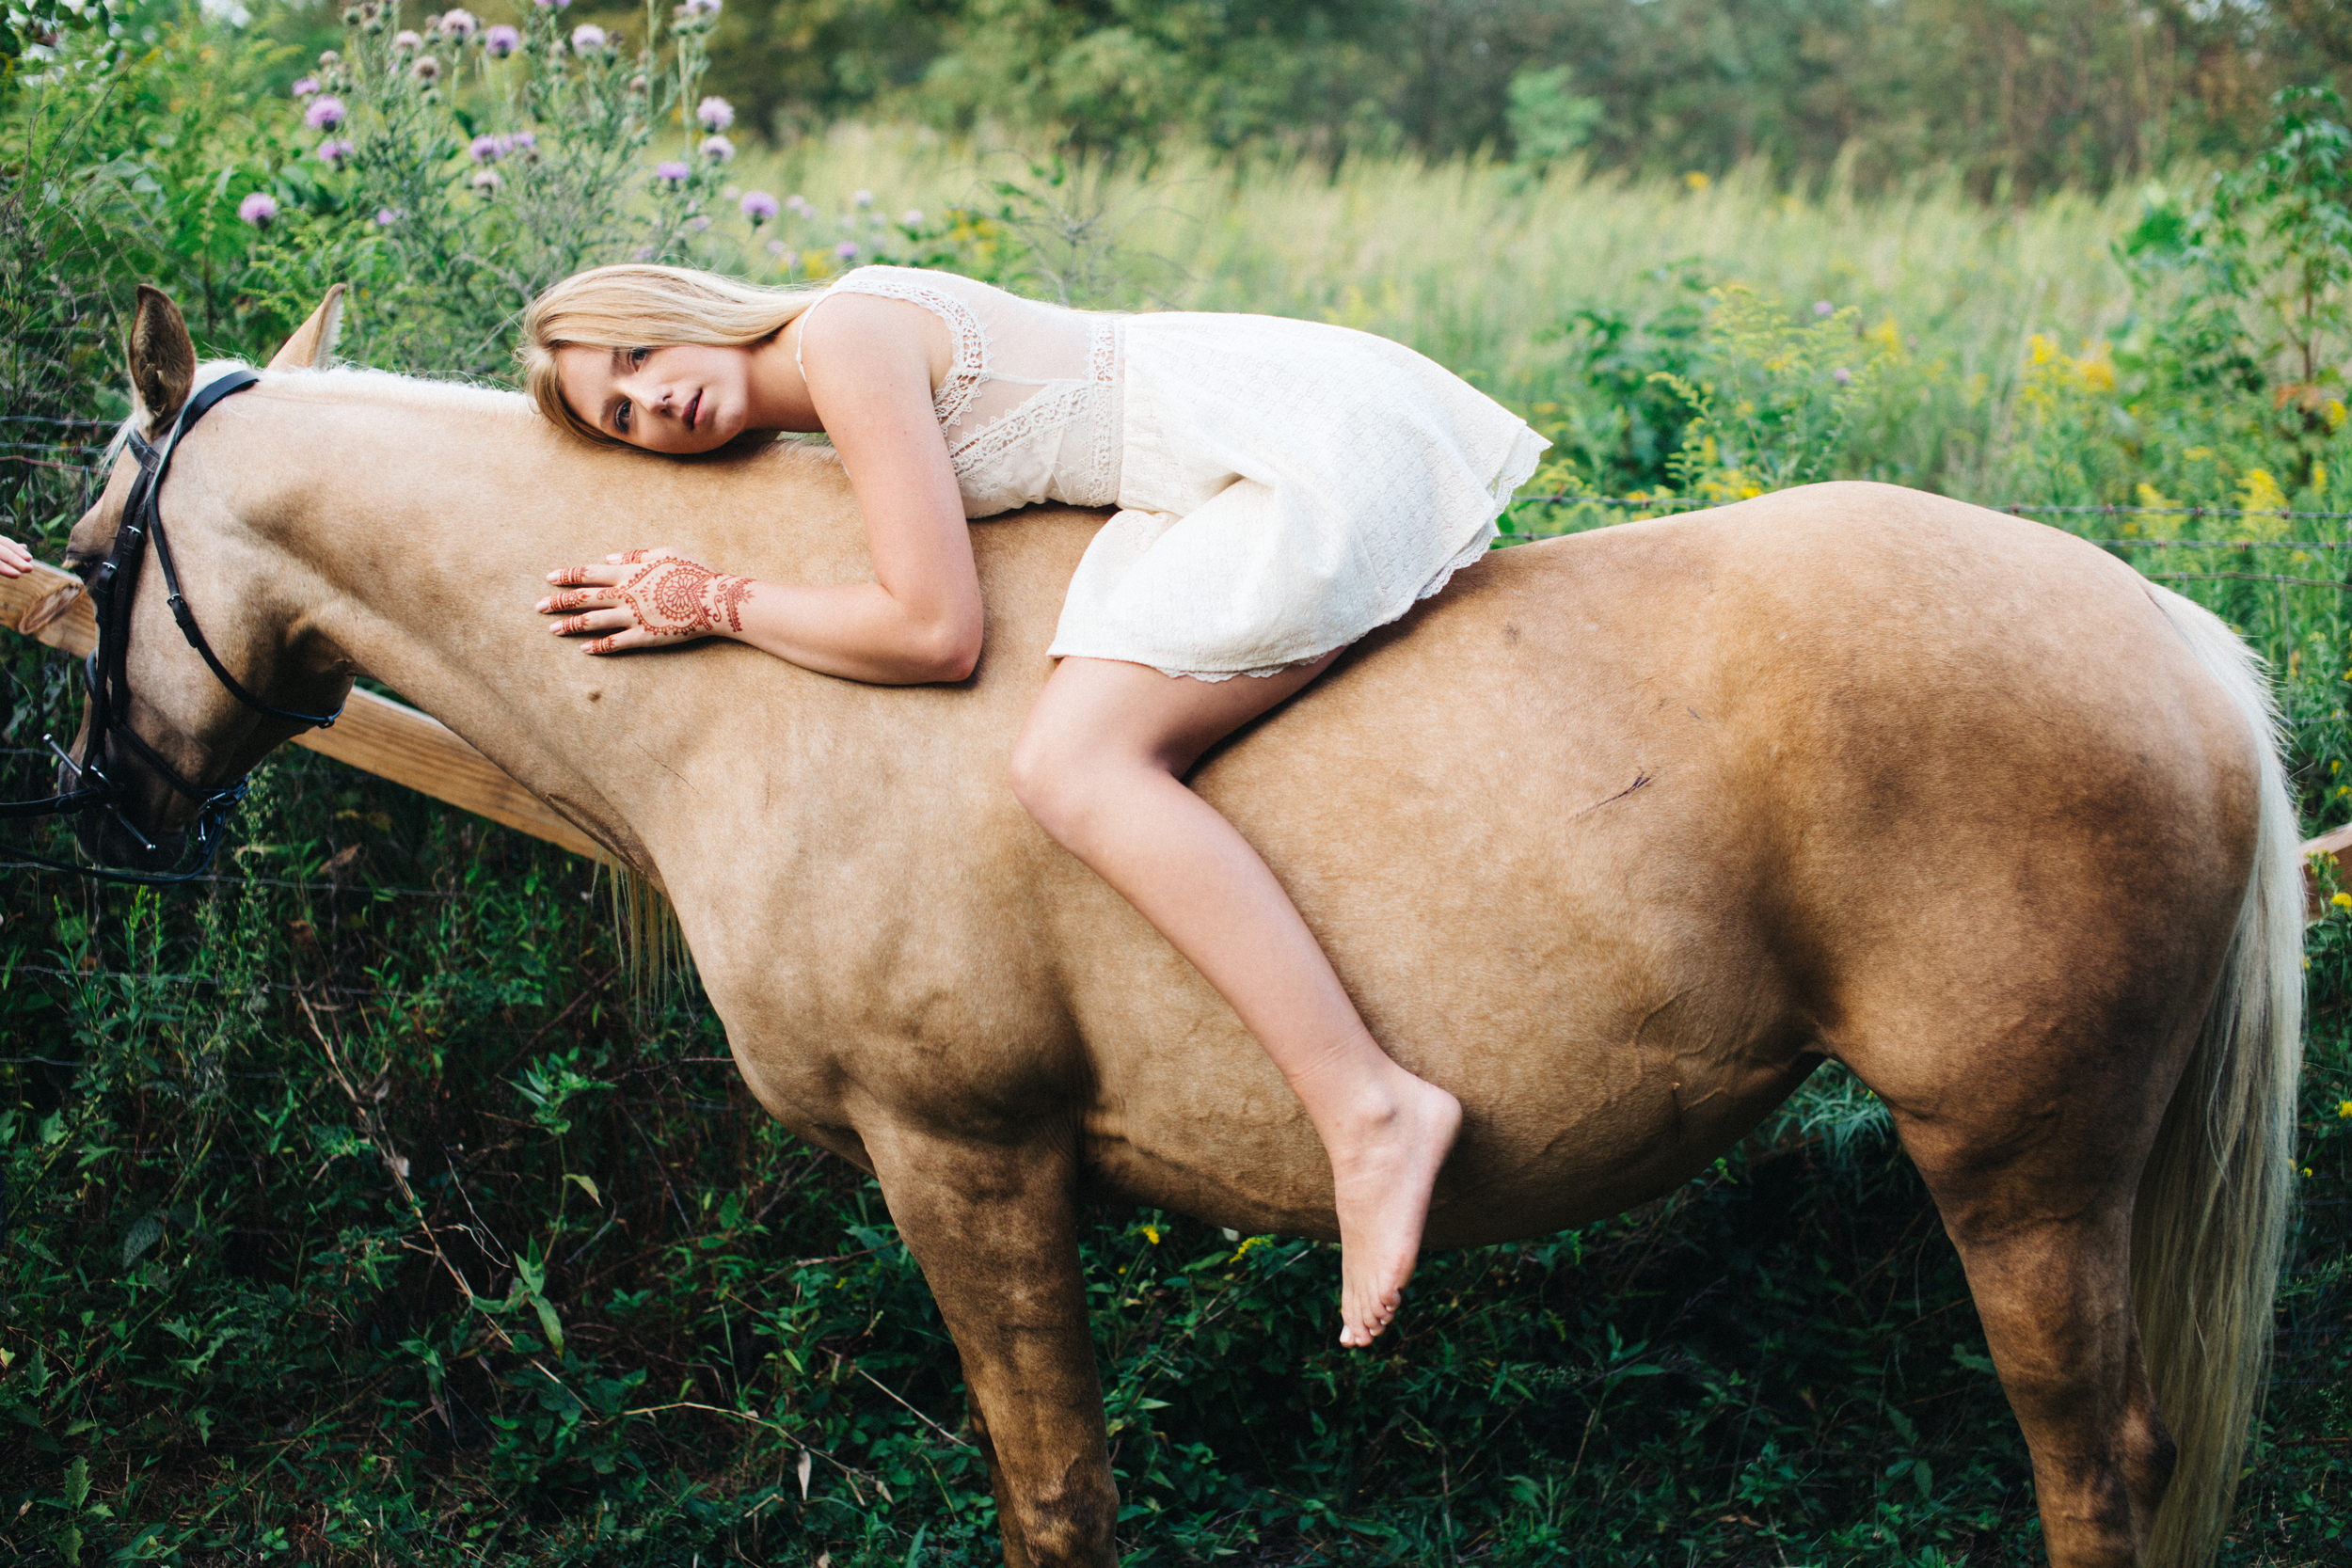 annapolis-maryland-senior-portrait-session-photographer-boho-horse-inspo-emma-jean-photography-10-photo.jpg